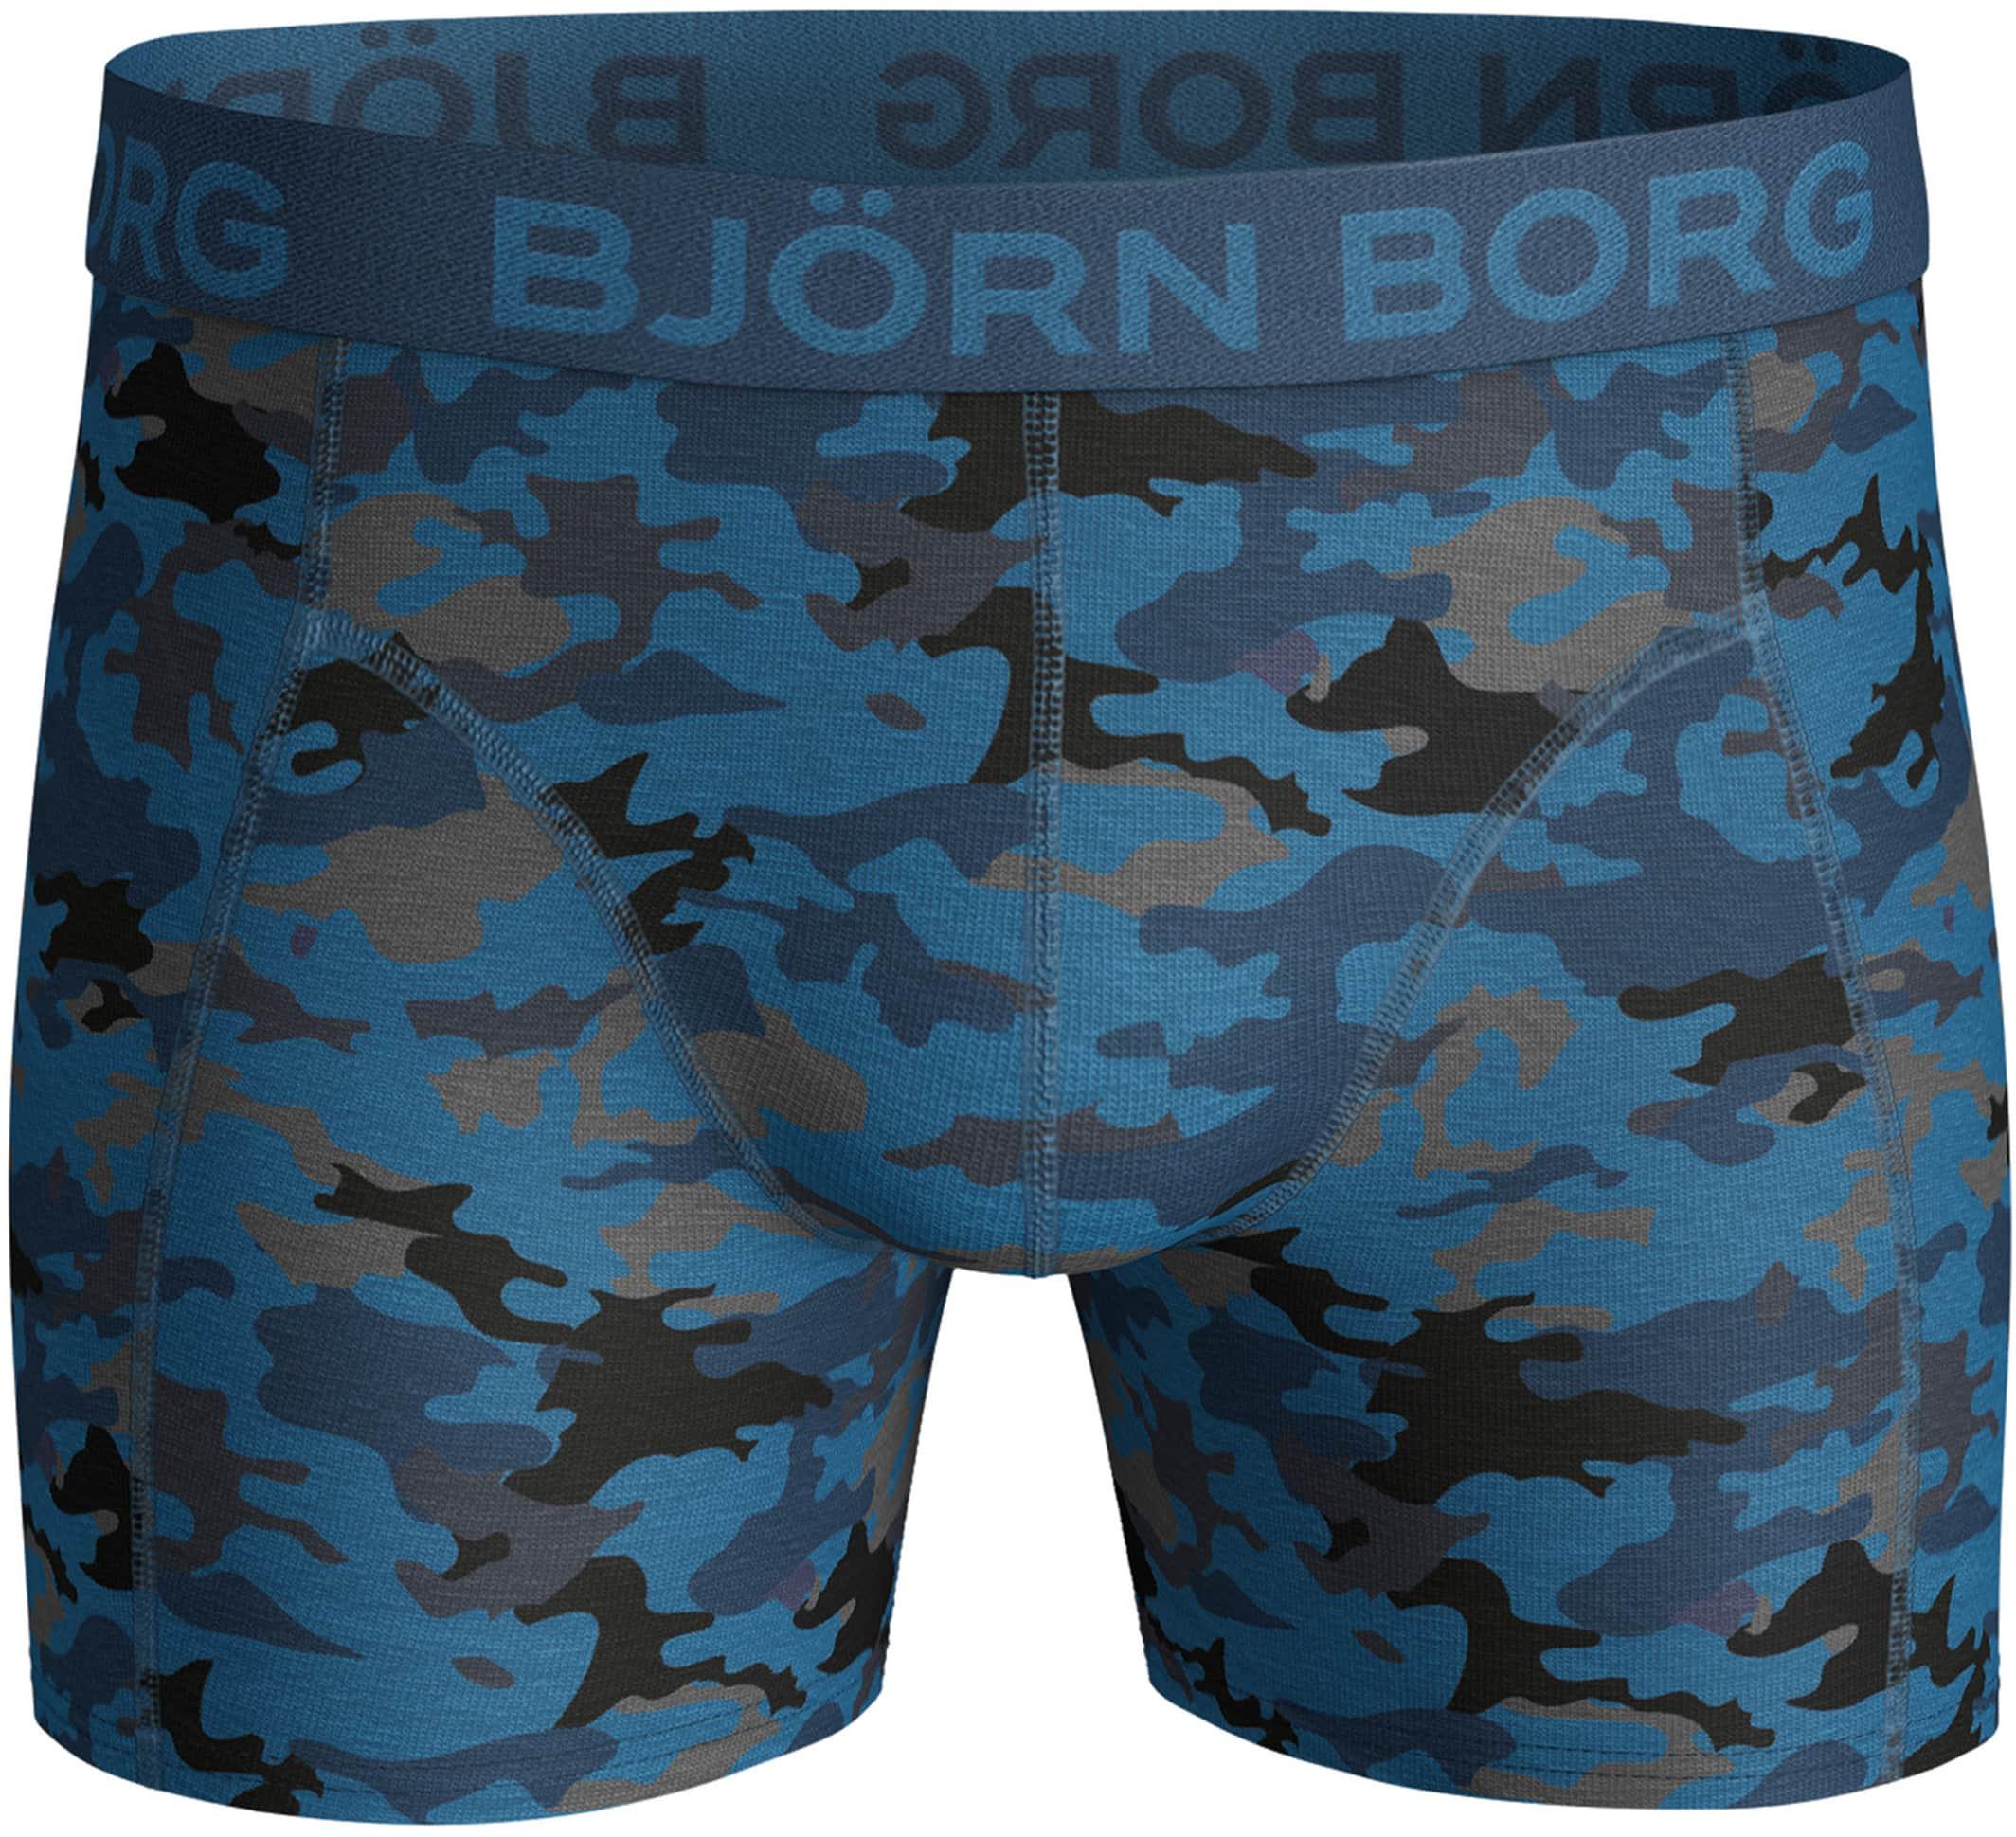 Björn Borg 2-Pack Shorts Dunkelgrau und Camo foto 1